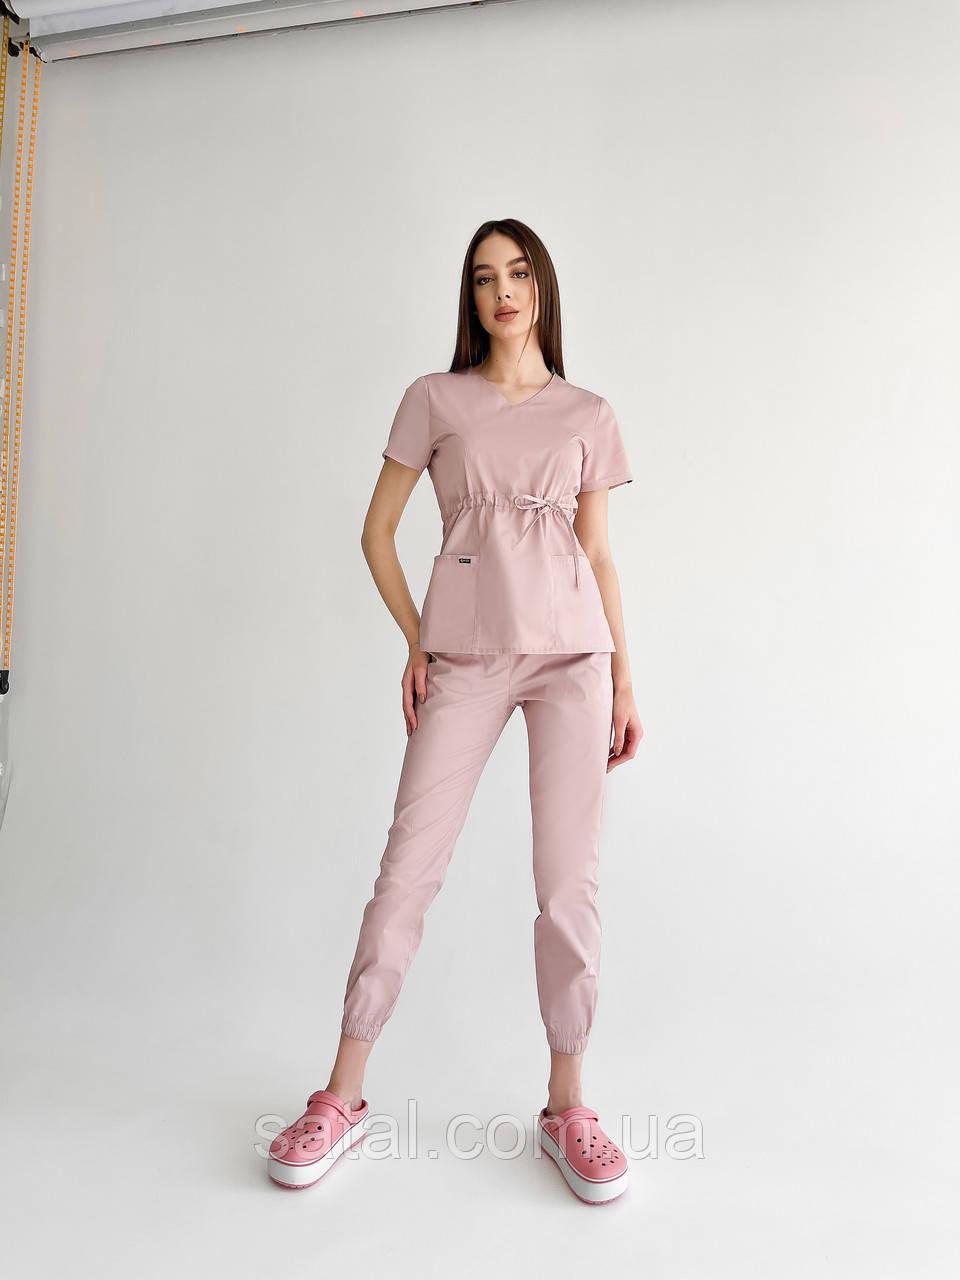 "Медицинский костюм ""Микато NEW"". Лиловый (розовый). Рукав короткий. ТМ Сатал"